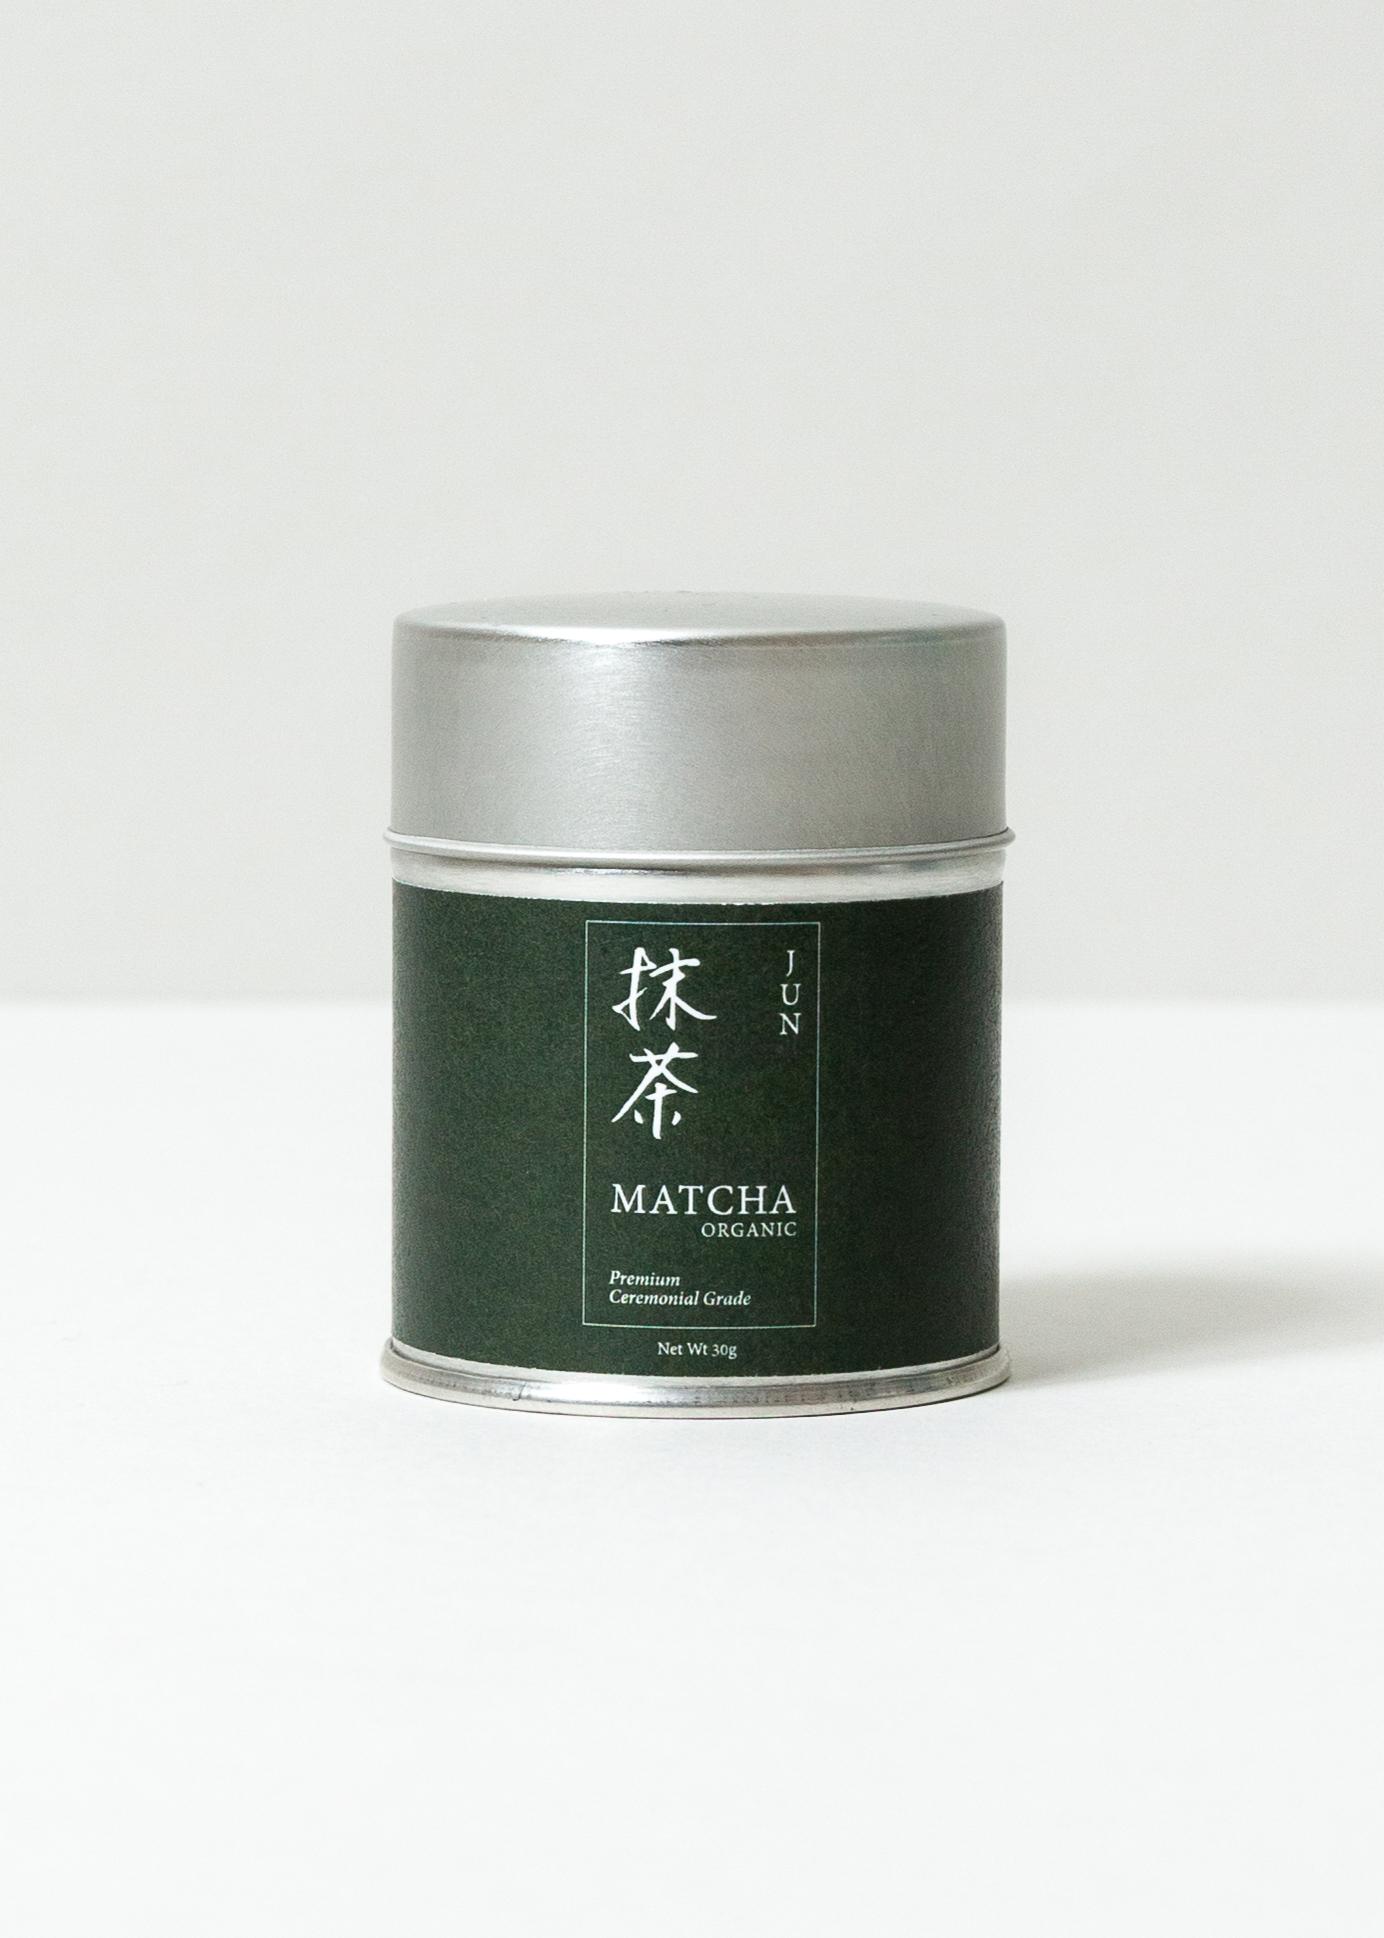 Morihata Organic Matcha